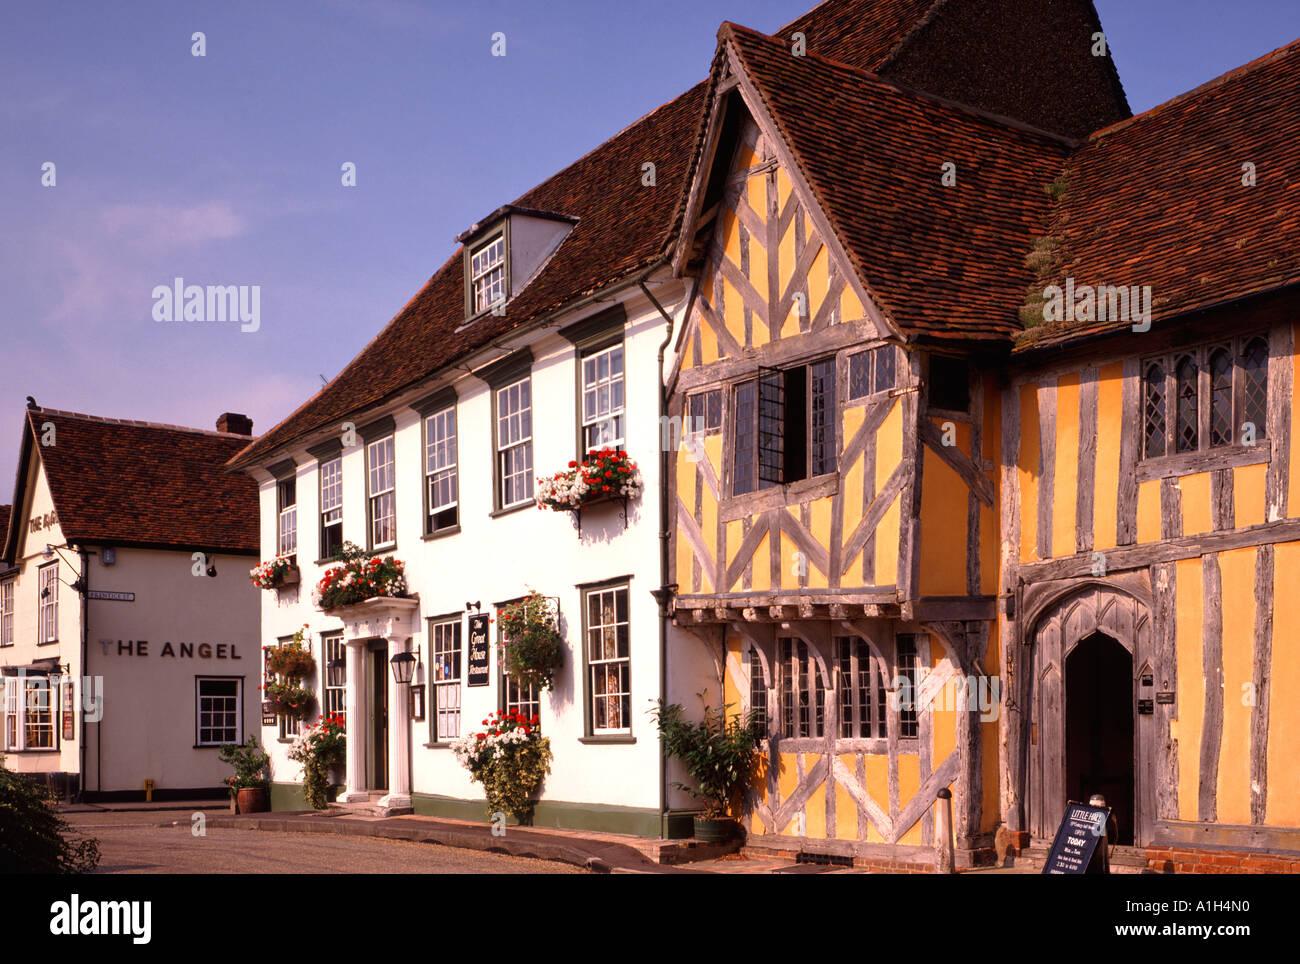 Little Hall, Lavenham, Suffolk, England, UK - Stock Image